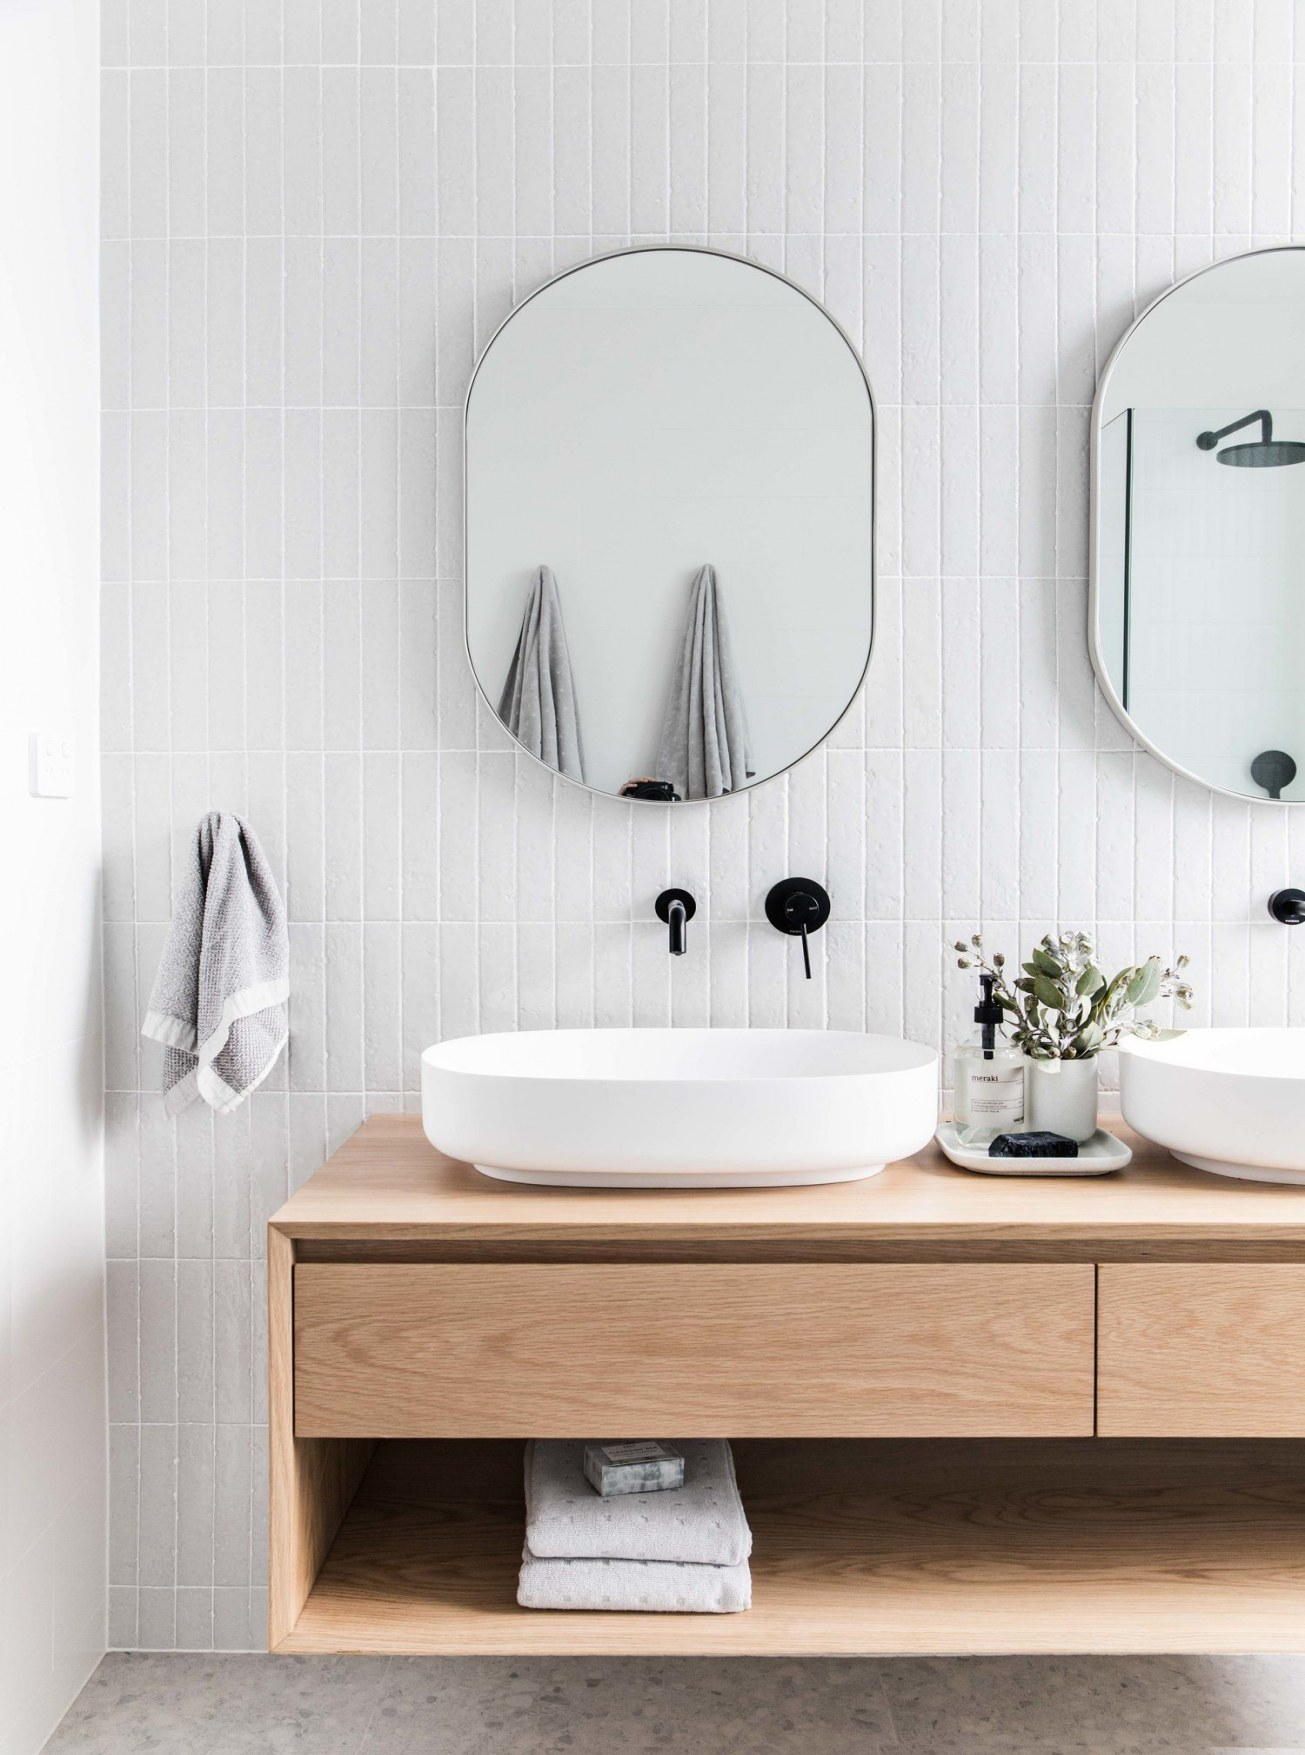 petite salle de bain deco miroir original